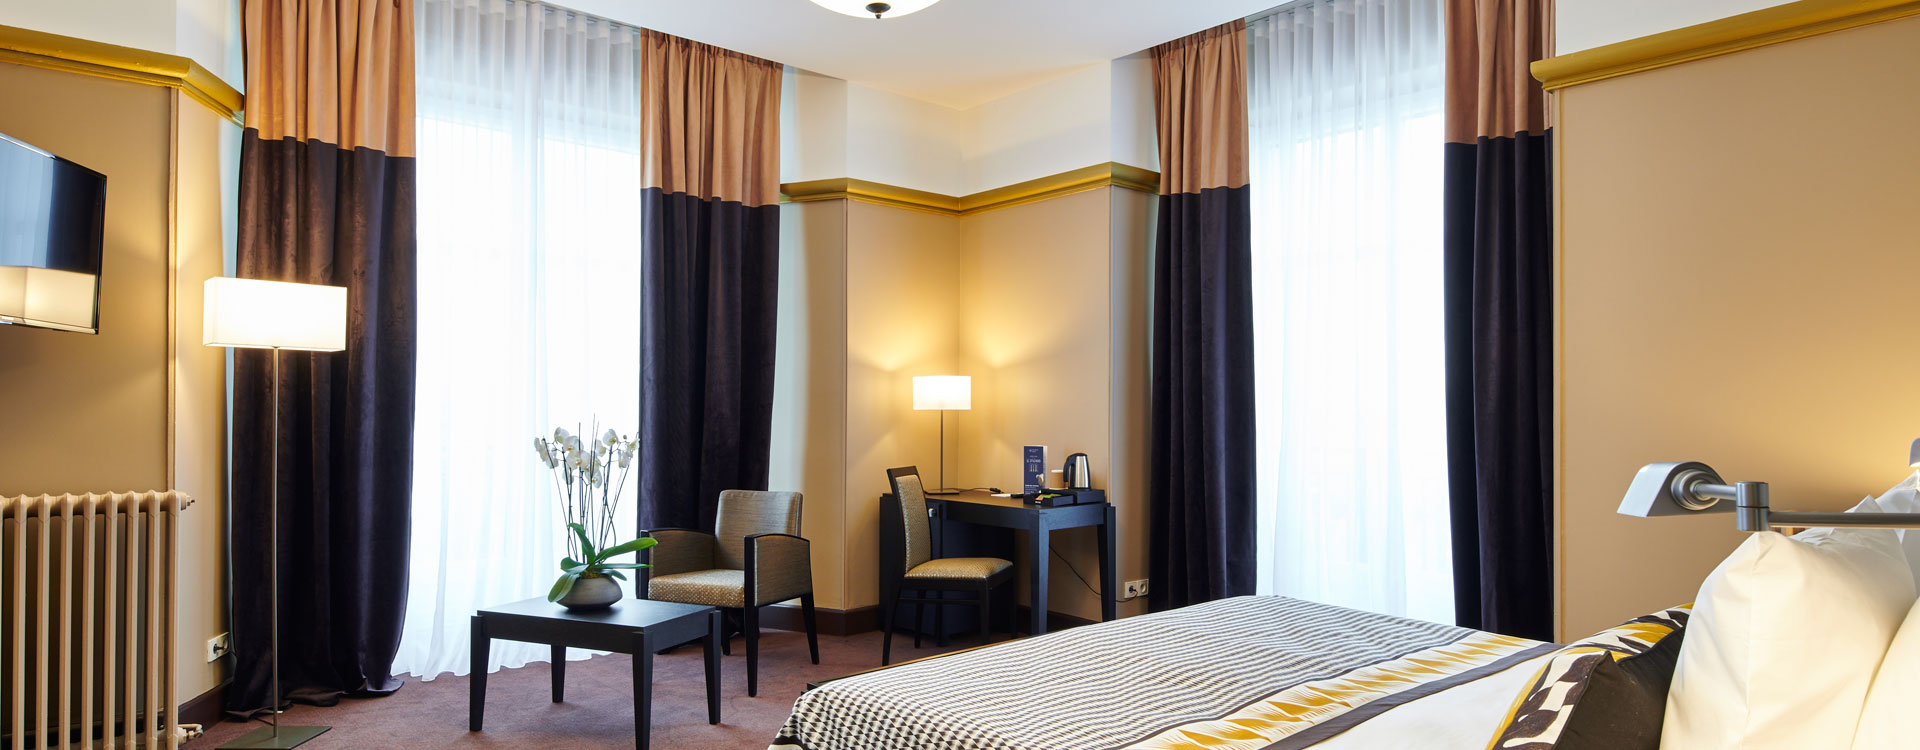 chambre hotel splendid dax